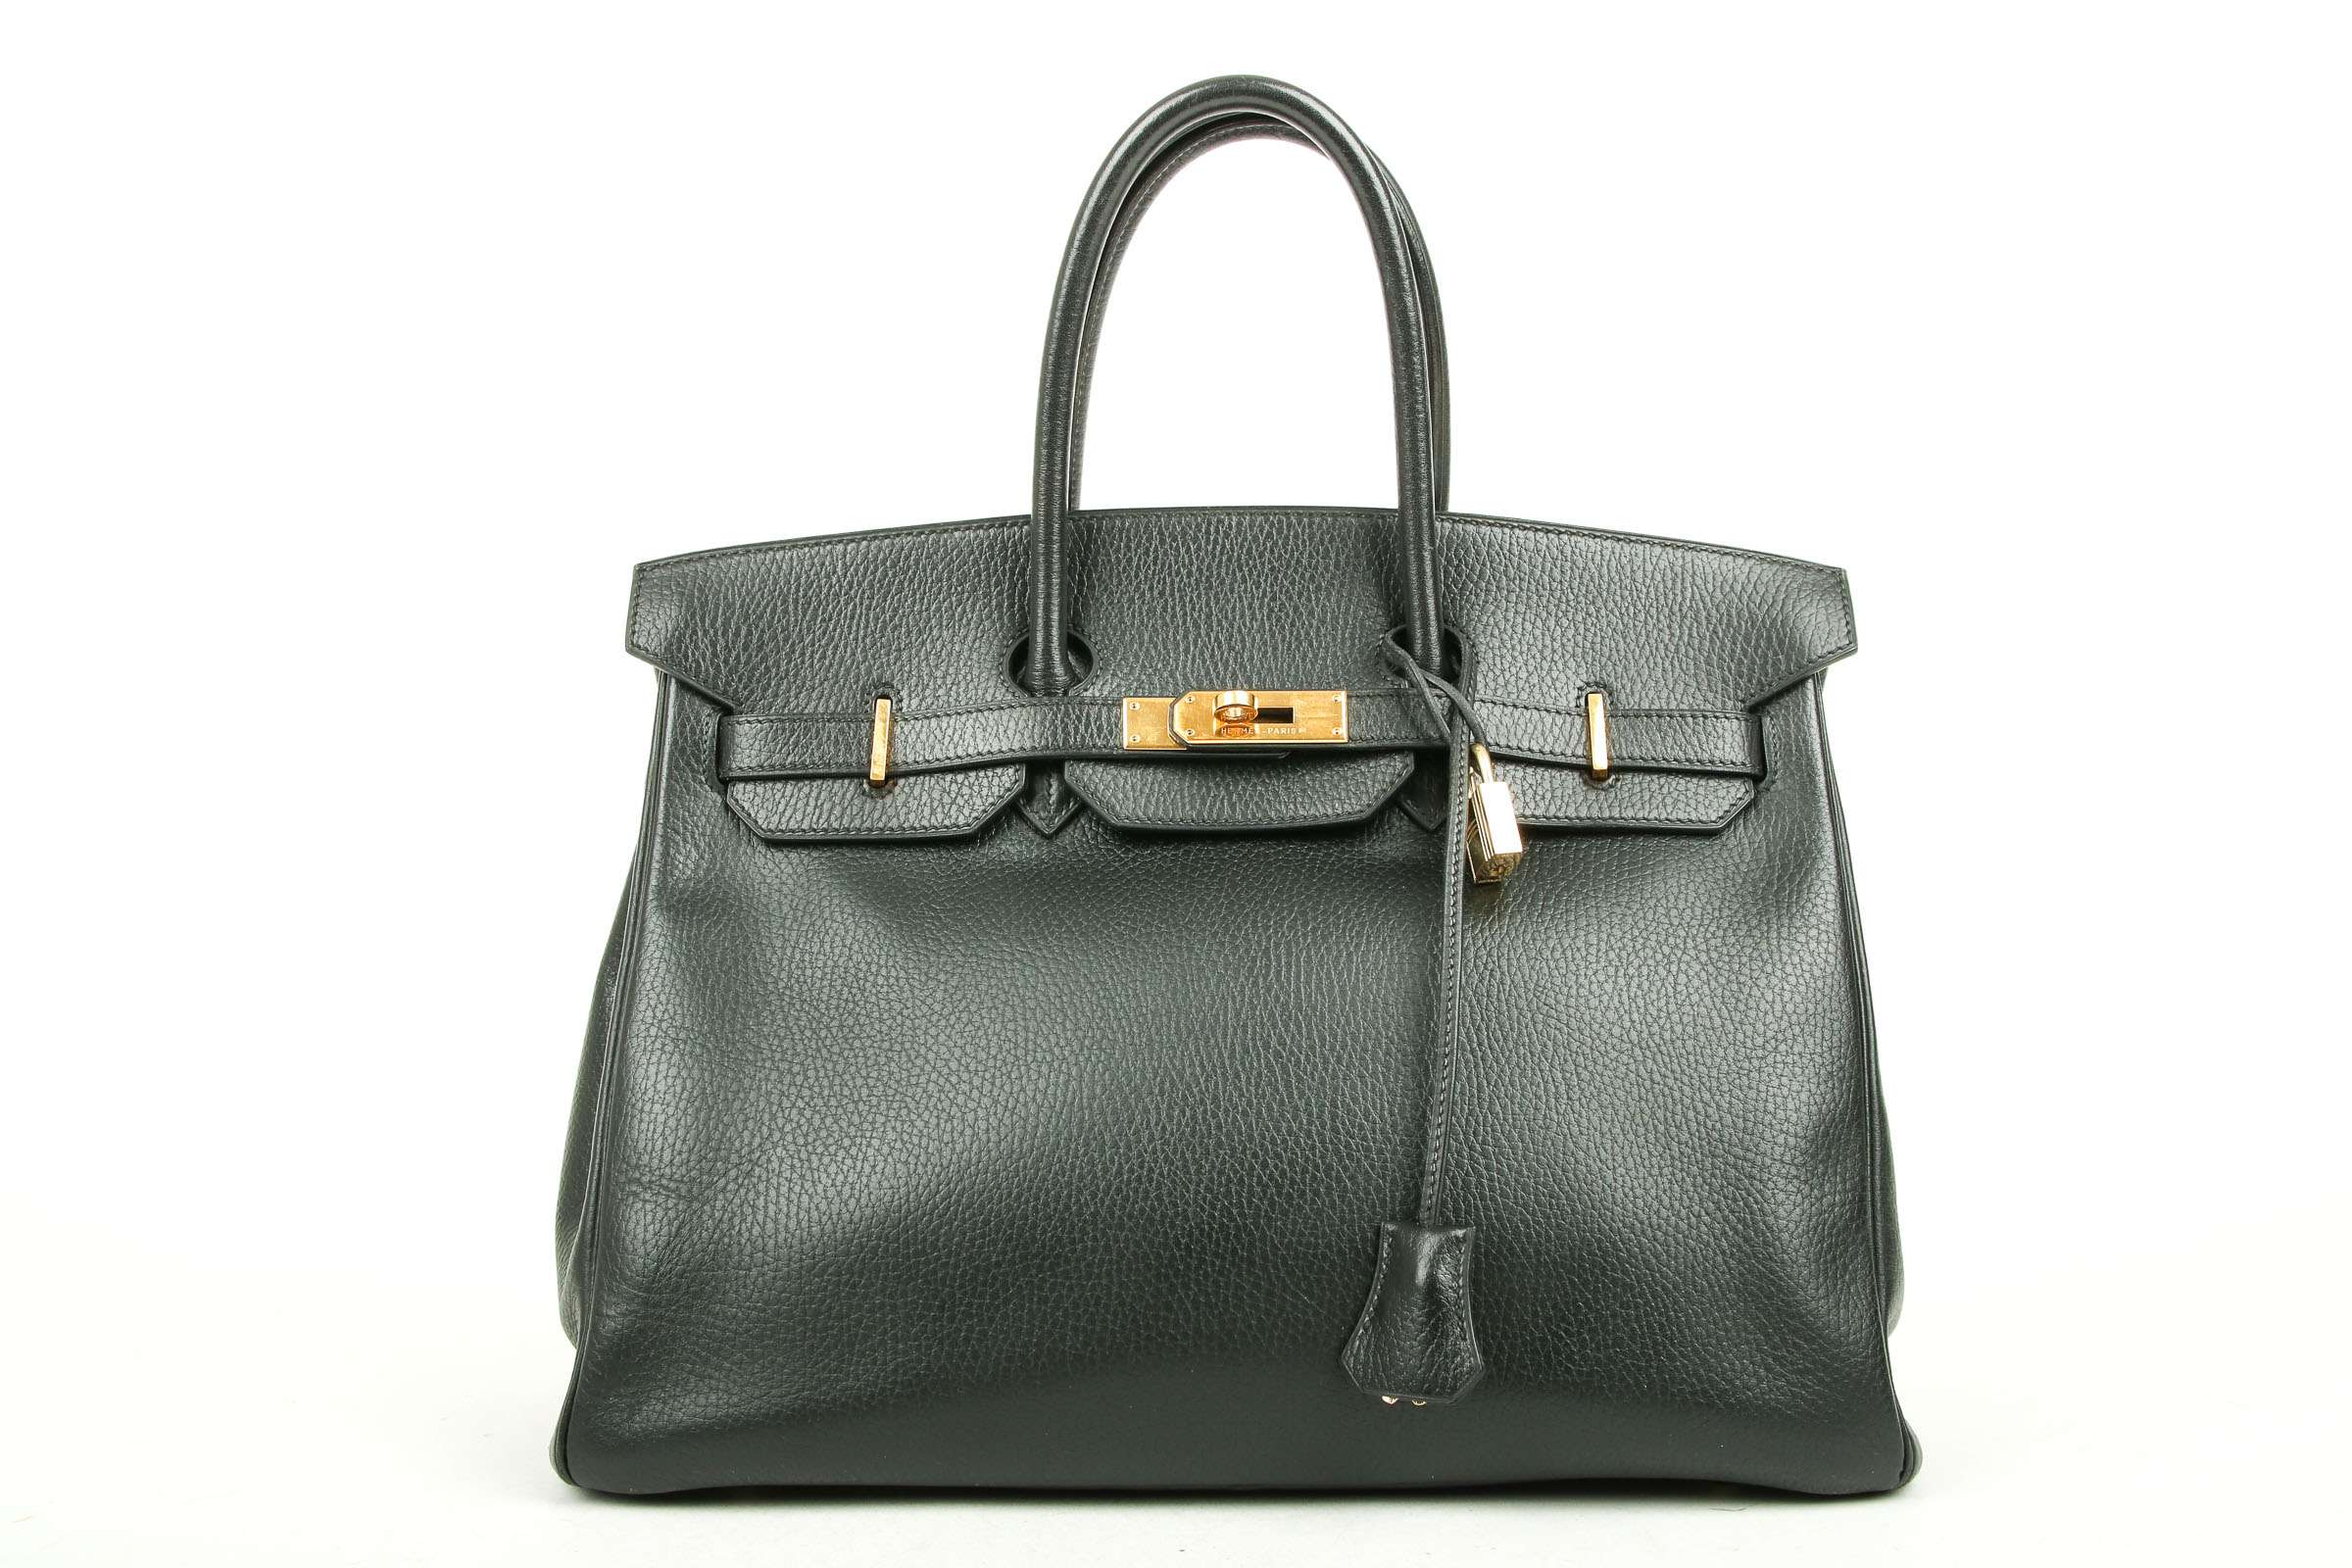 821edb76a2b Hermès Birkin 35 Black Ardennes leather | Luxussachen.com